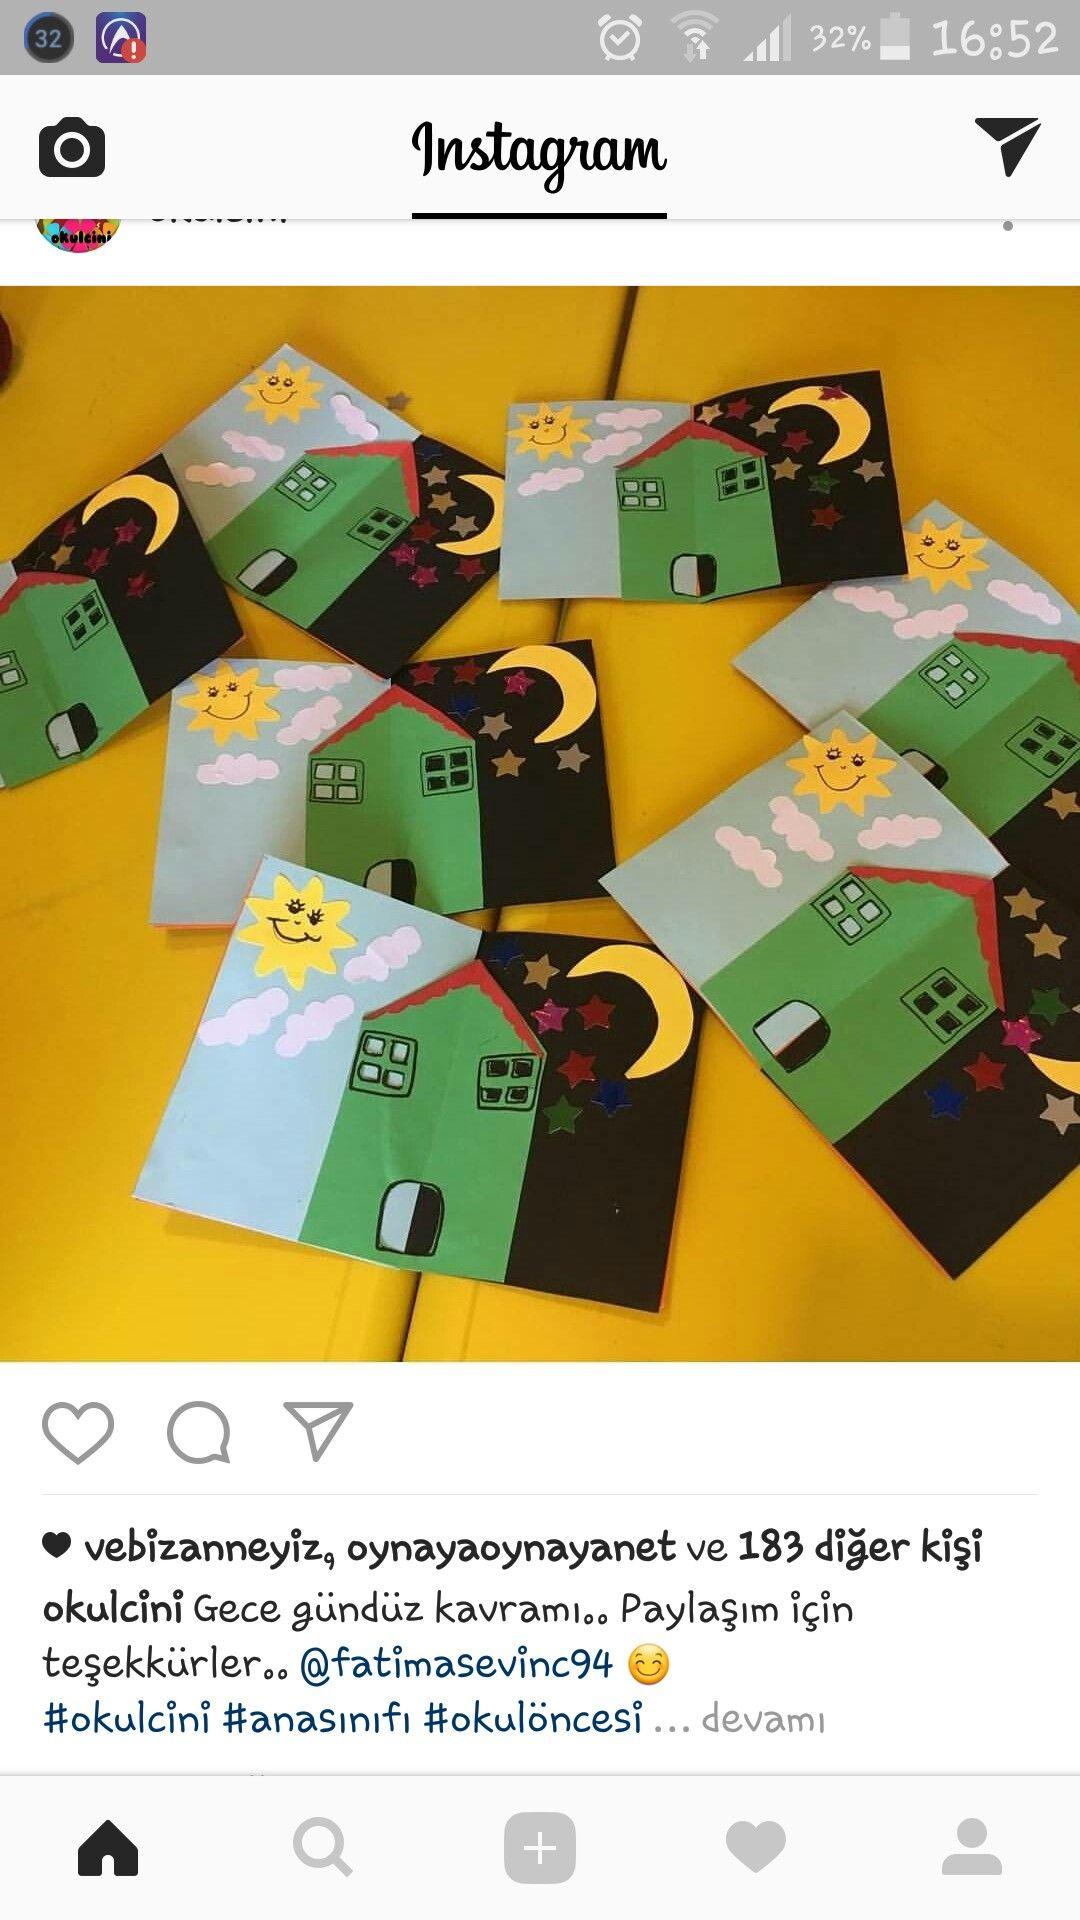 Pin by Çocuk İşi on Kavramlar | Pinterest | Crafts